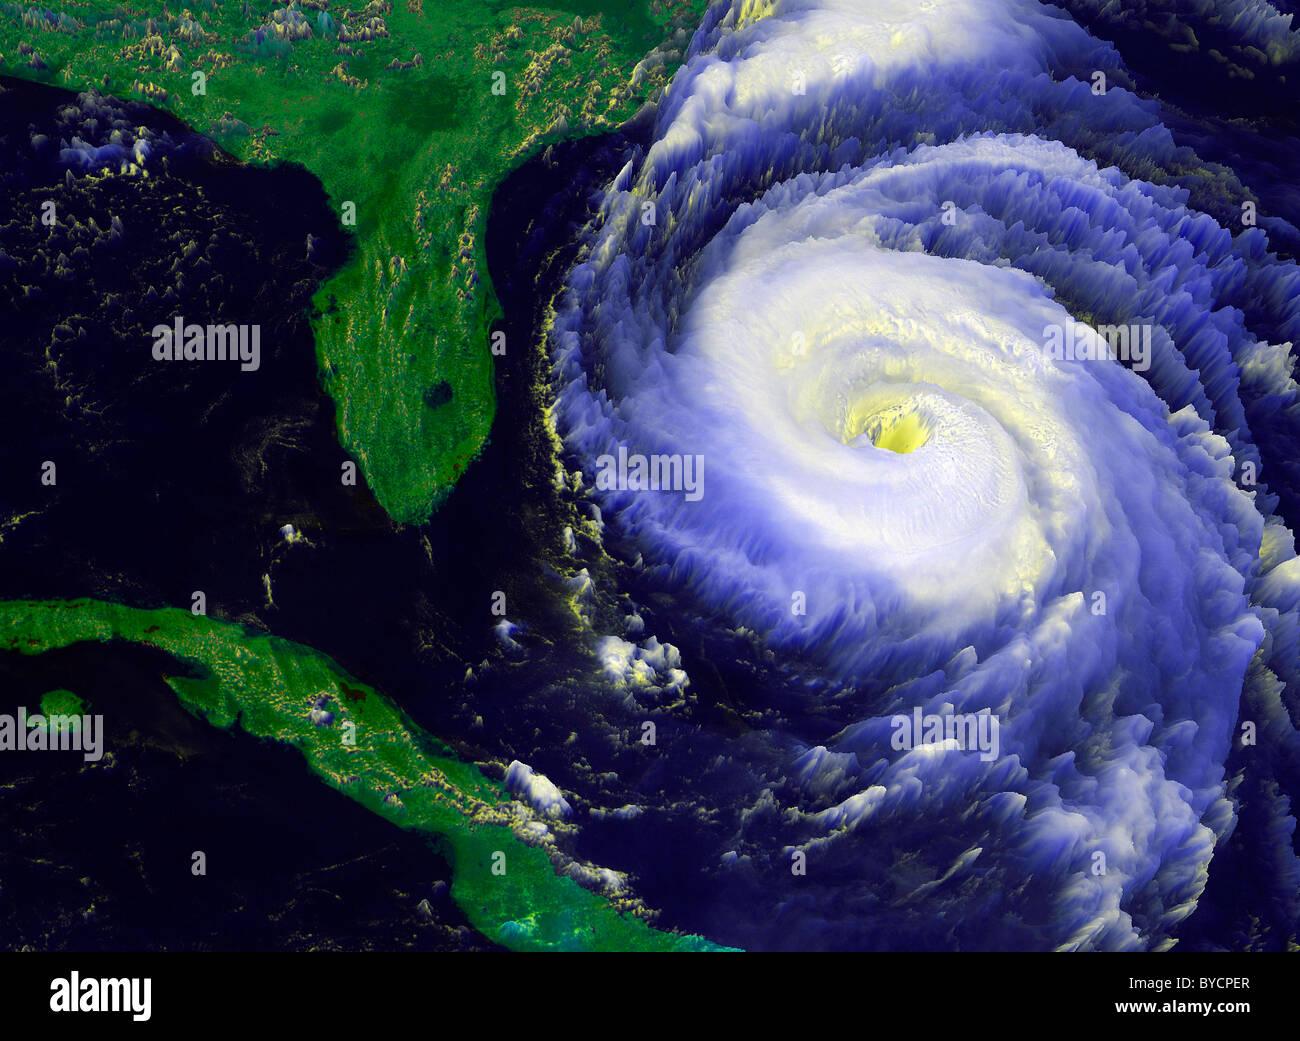 Hurricane Fran approaching Florida western Atlantic NOAA's GOES-8 Geostationary Operational Environmental Satellite - Stock Image